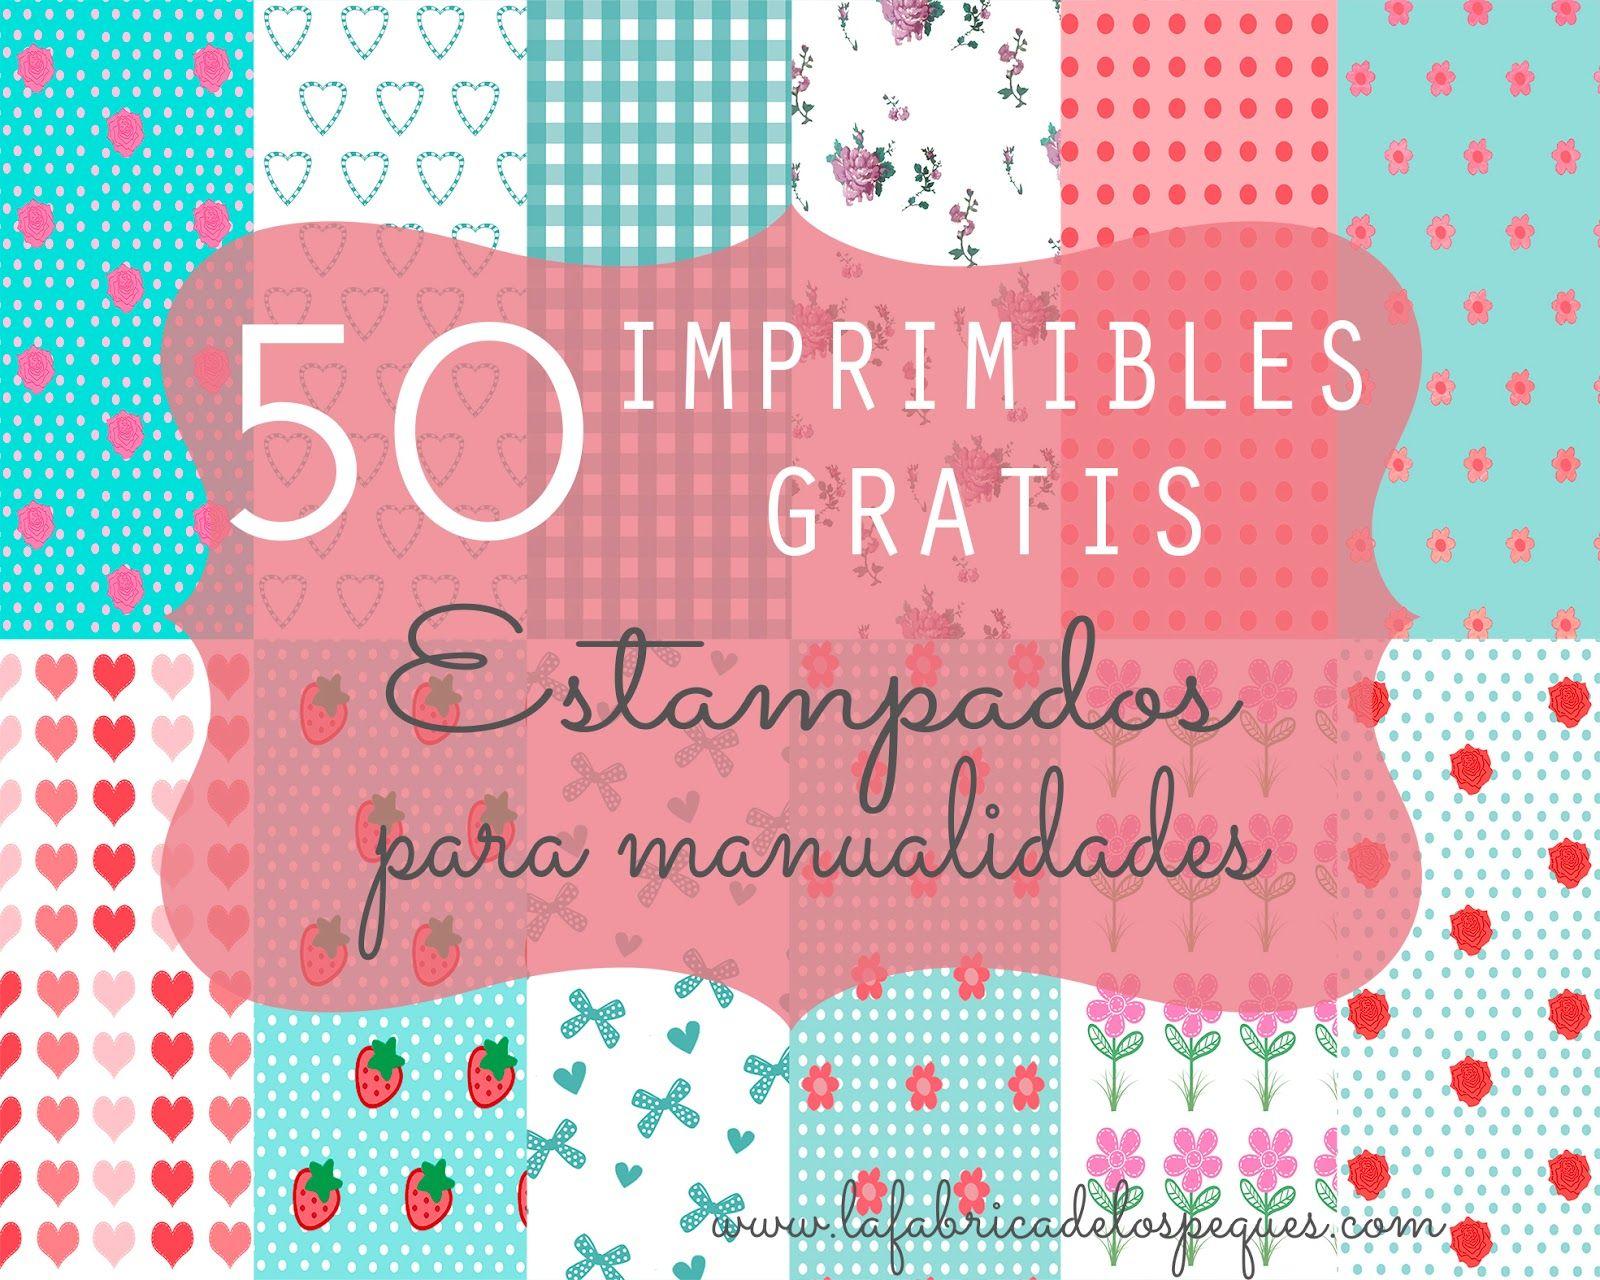 50 Imprimibles Gratis Estampados Para Manualidades Kits Imprimibles Gratis Plantillas Imprimibles Papeles Scrapbooking Para Imprimir